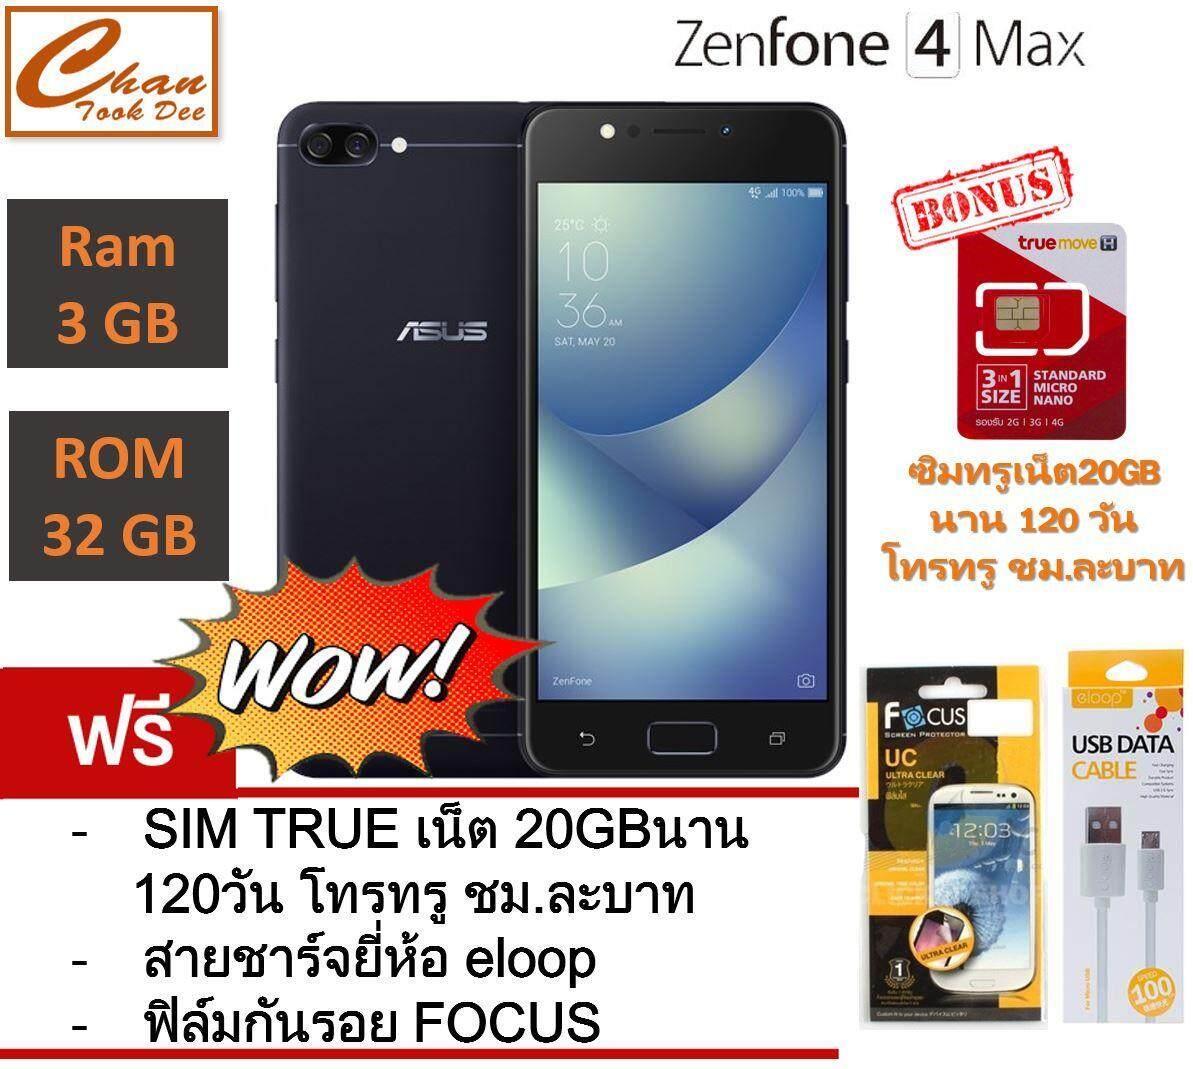 "ASUS Zenfone 4 Max 5.2"" (ZC520KL) Ram3GB / Rom32GB ประกันศูนย์ไทย  ฟรี  ฟิล์มกันรอย FOCUS +  ซิมทรูเน็ต20GB นาน 120 วัน โทรทรู ชม.ละบาท + สายชาร์จยี่ห้อ eloop"